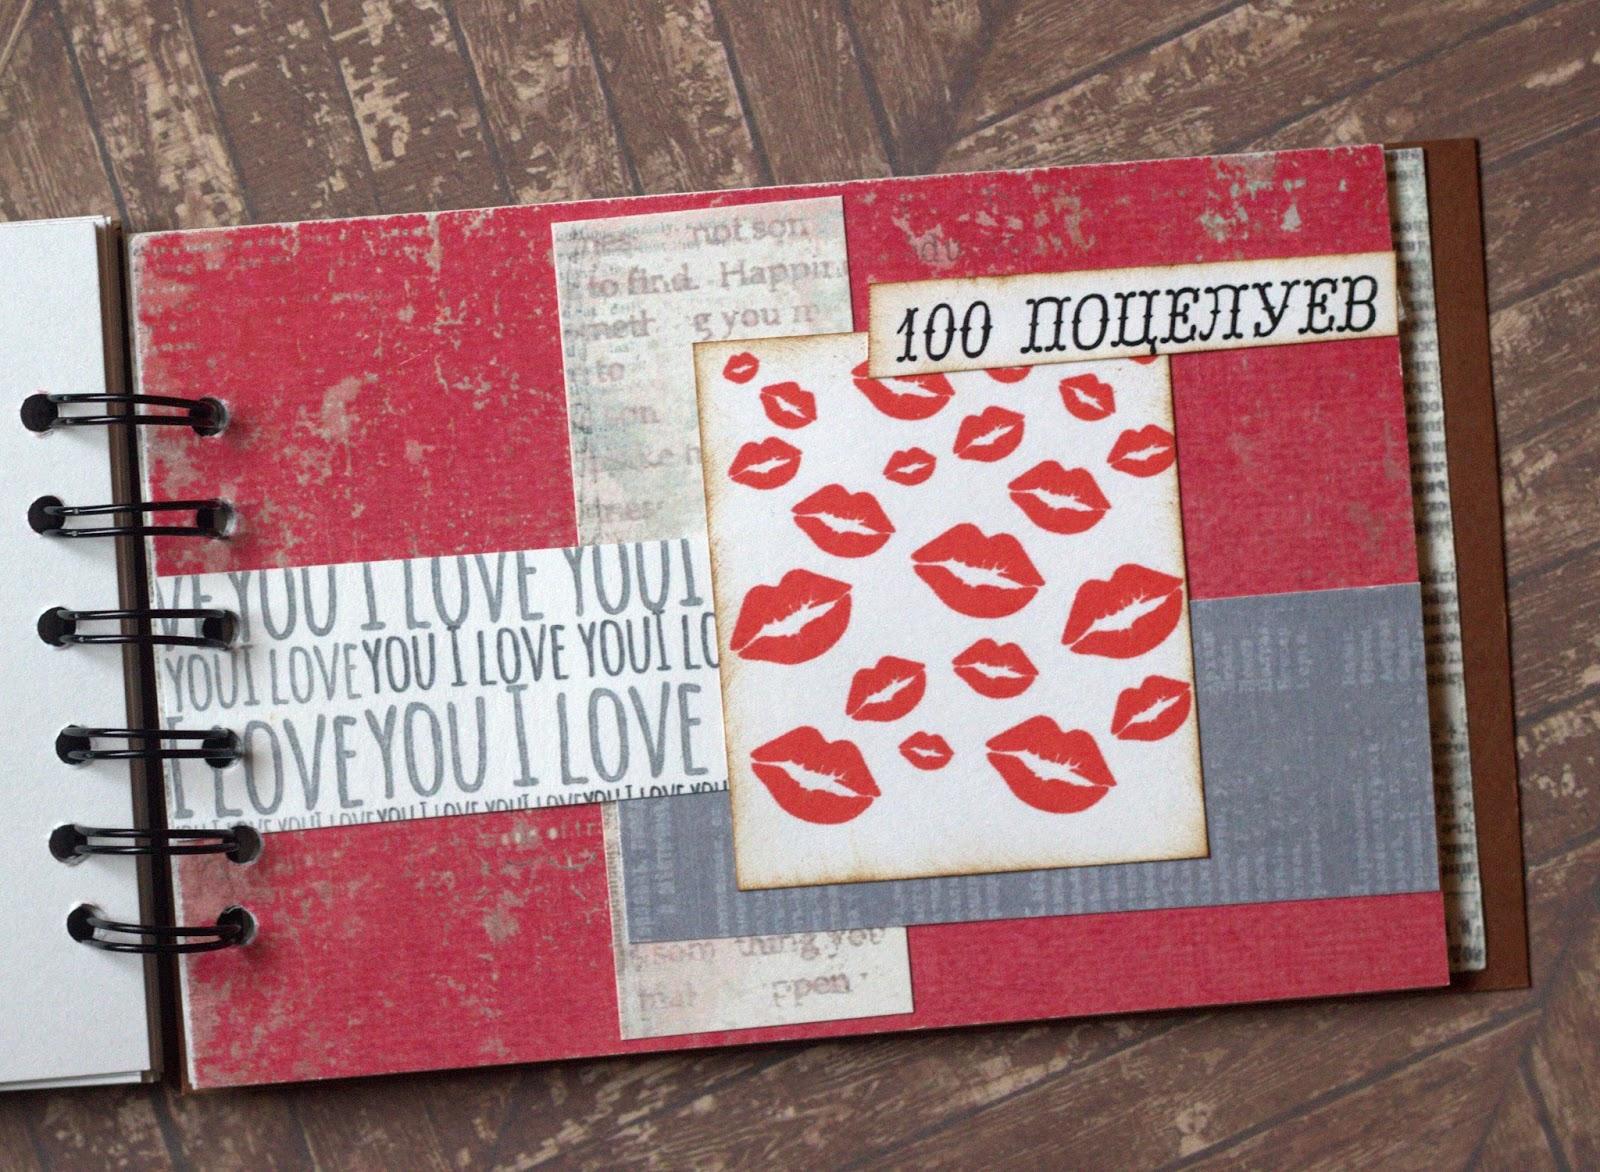 Принц целует, 100 поцелуев открытка